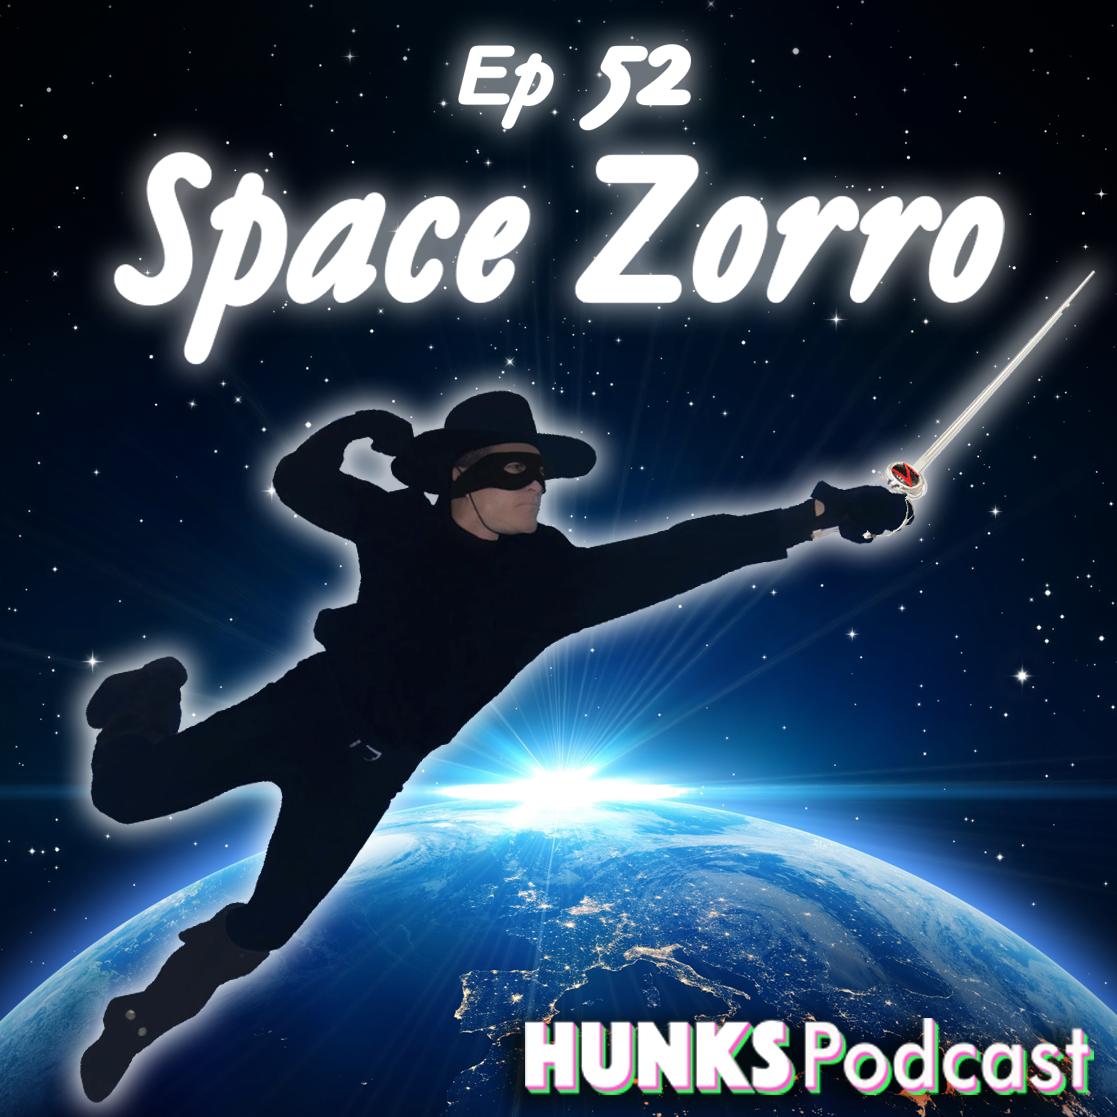 HUNKS Podcast Ep # 052 Space Zorro